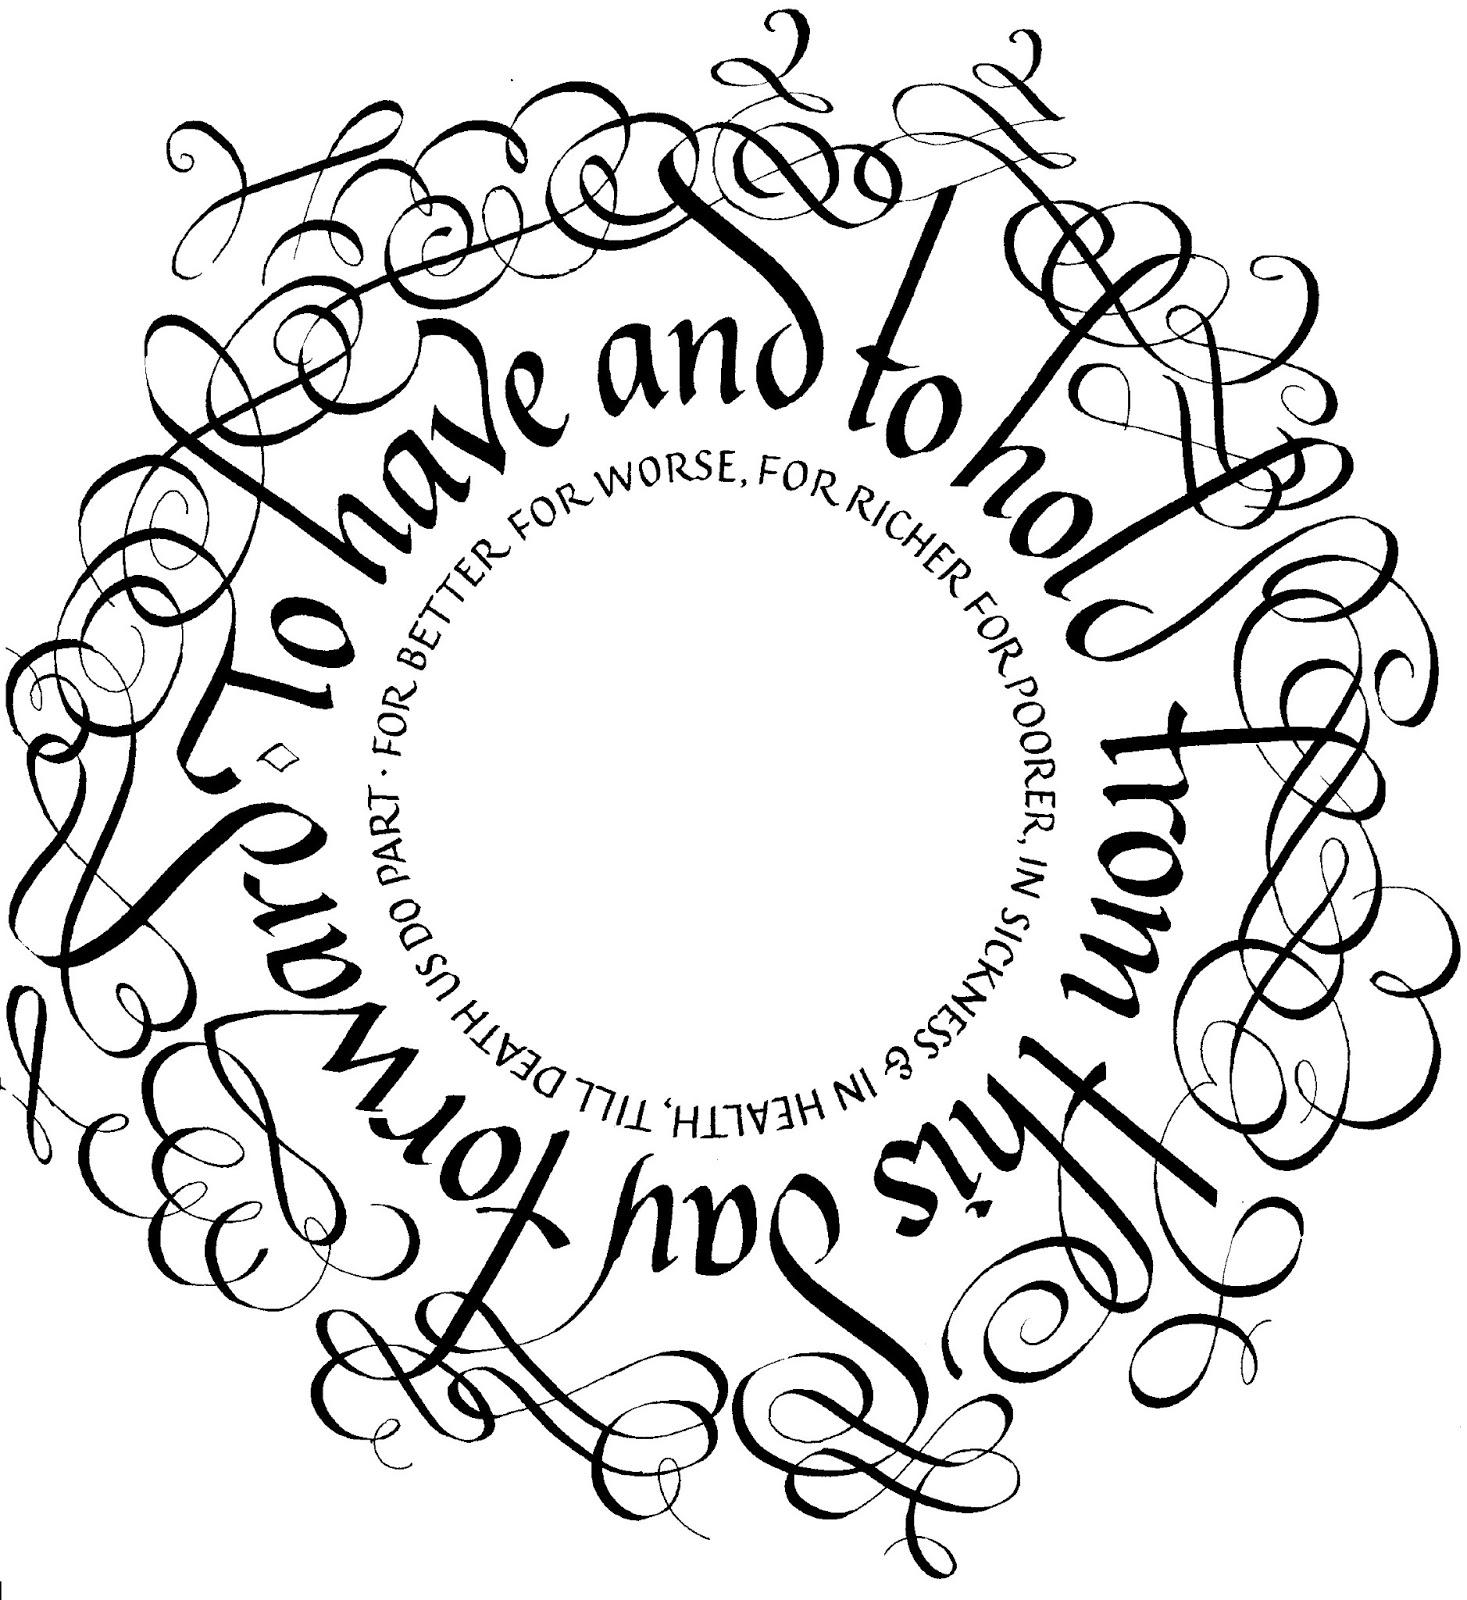 Margaret Shepherd Calligraphy Blog February 2013